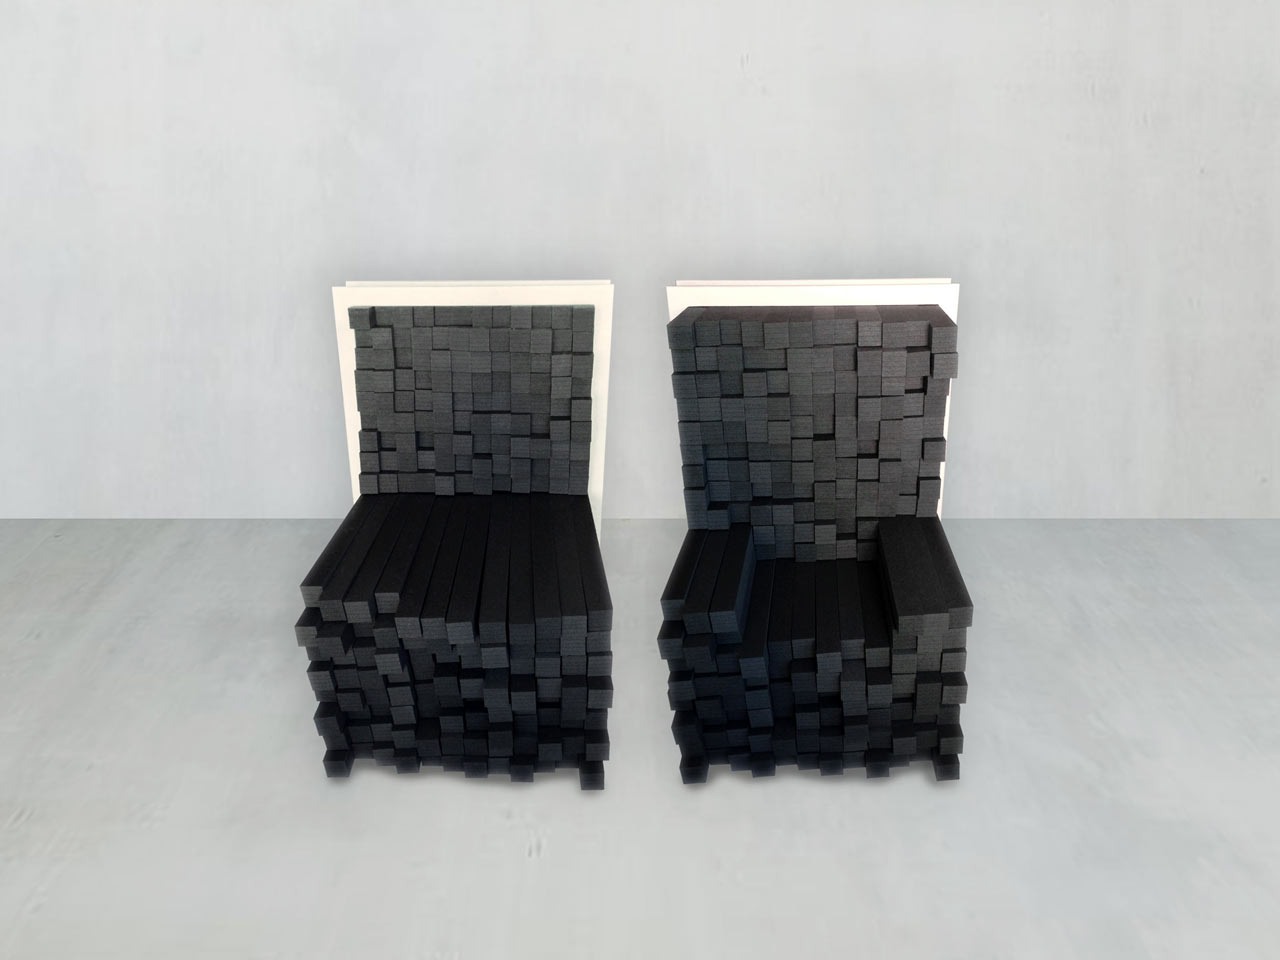 Keren_Shiker-Sink_In-Adjustable-Seating-hisheji (7)